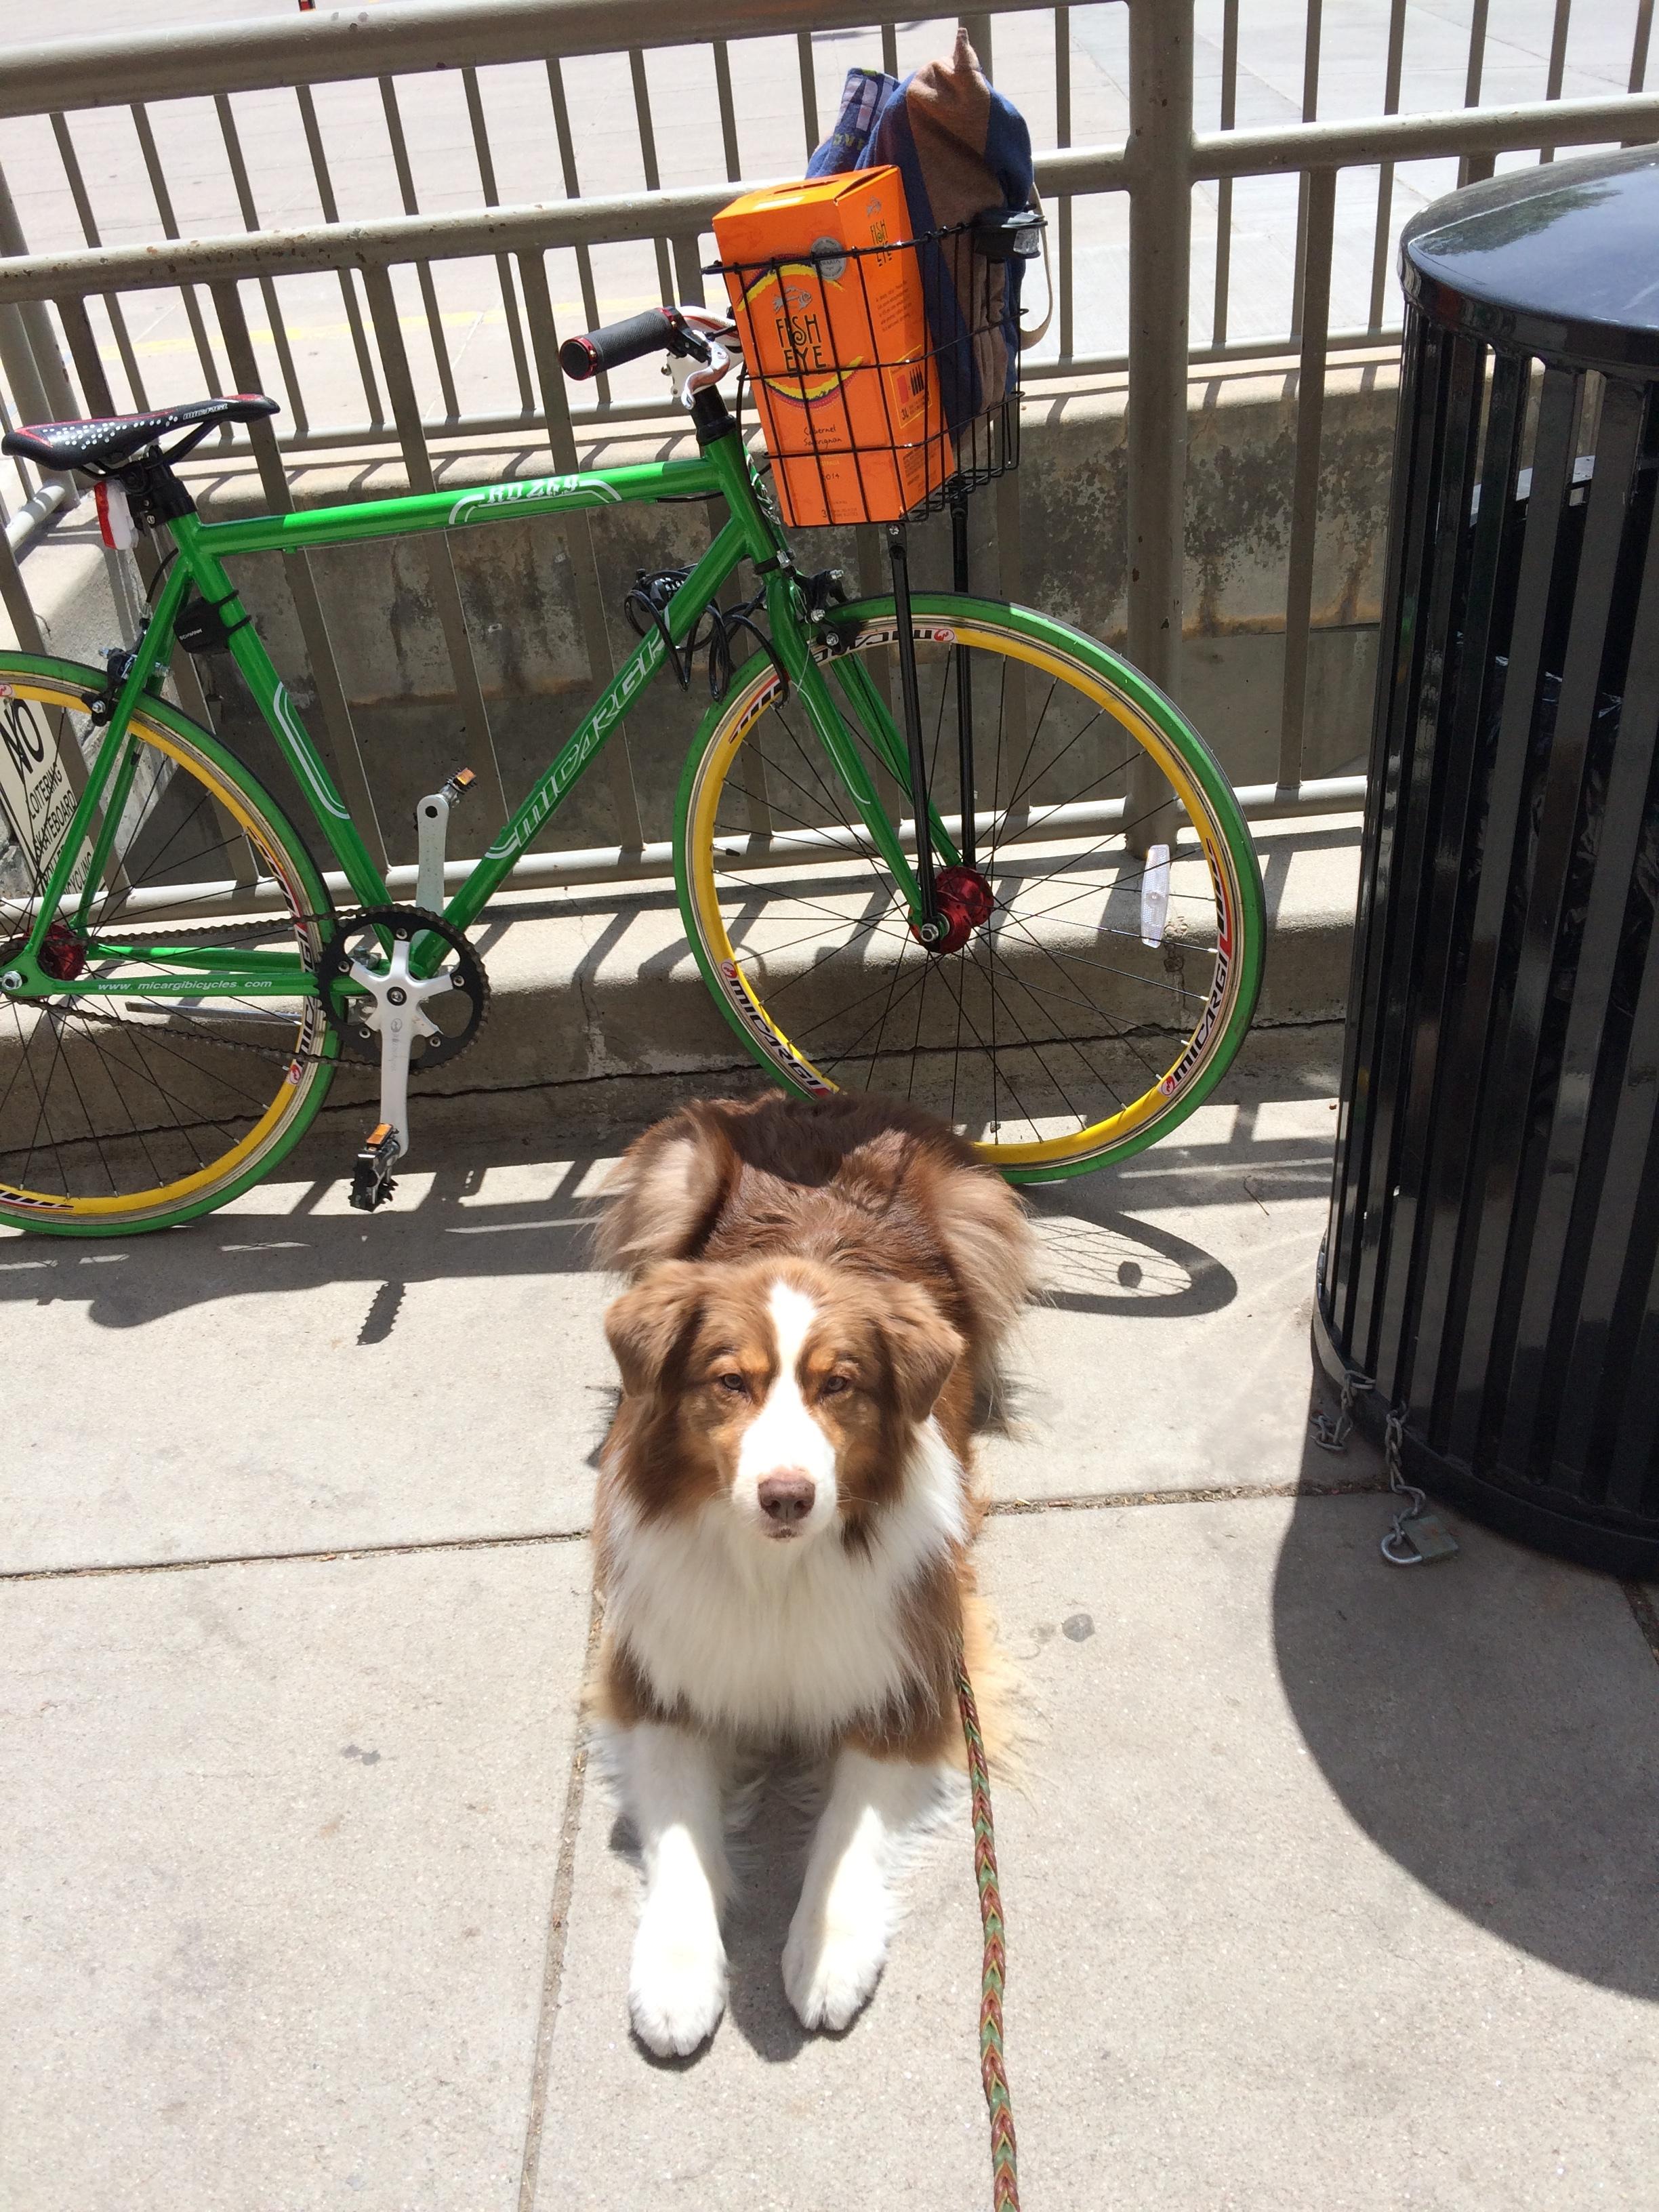 Roo loves biking adventures!